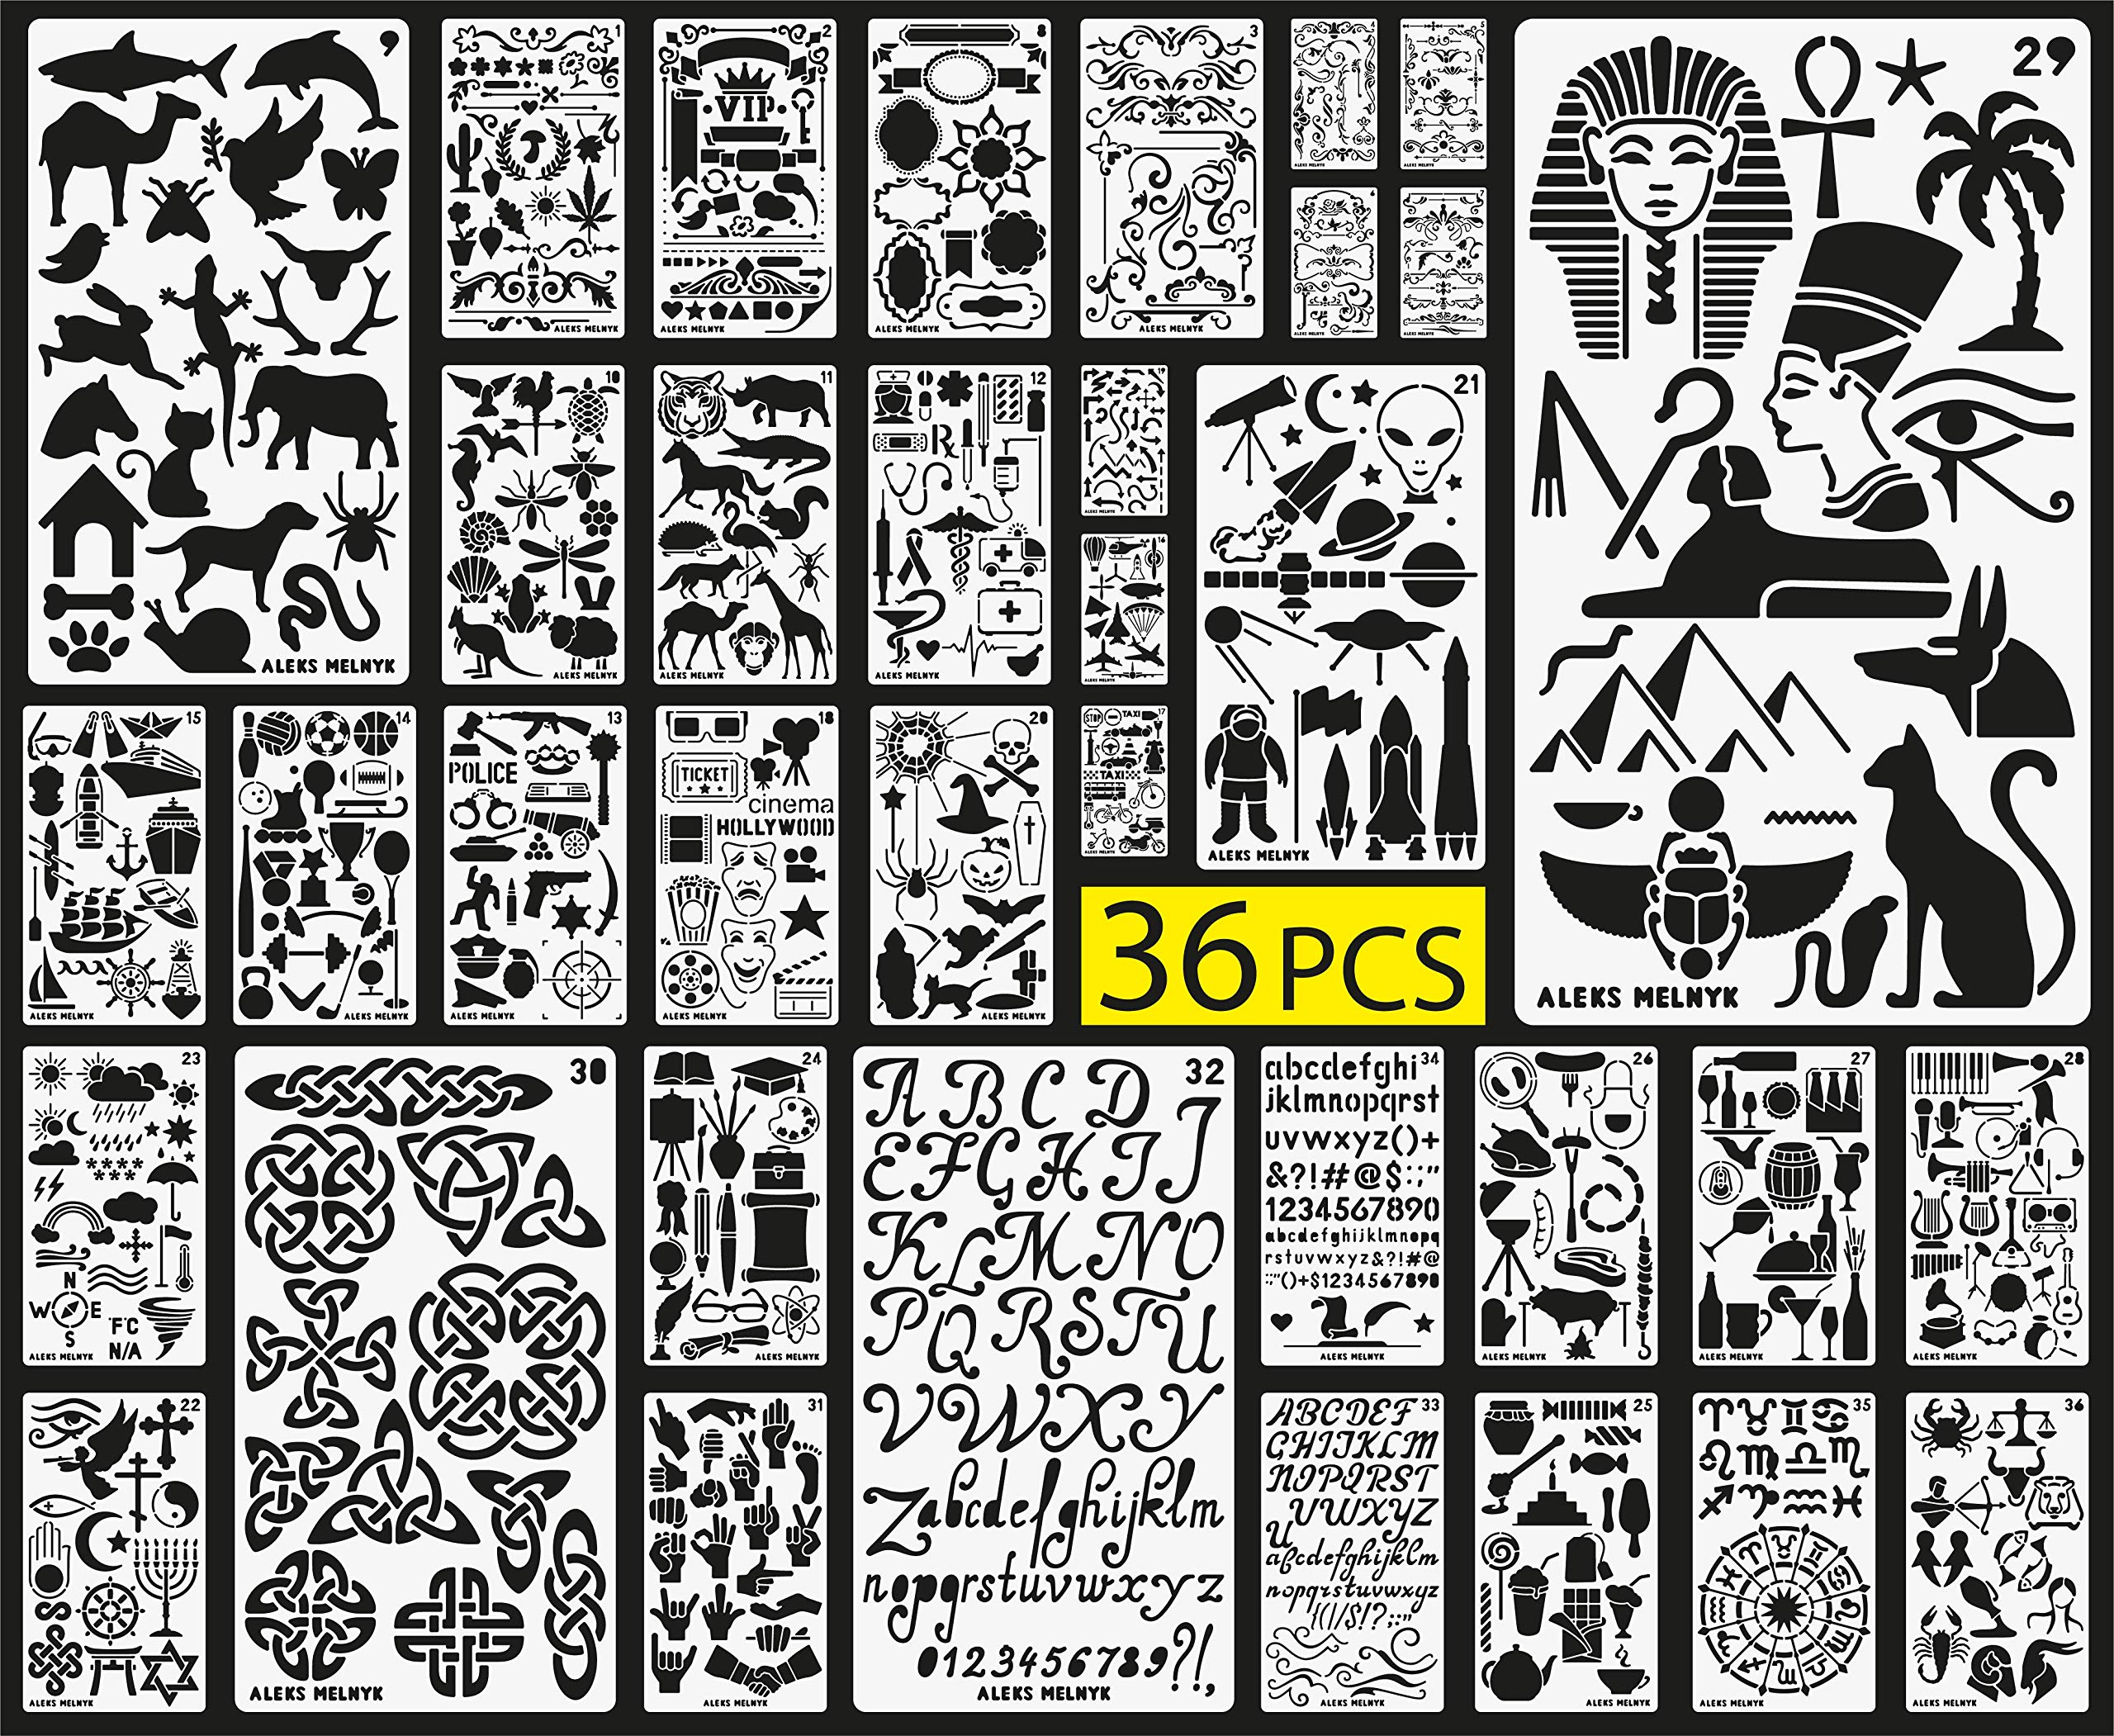 Aleks Melnyk Plastic Stencils/36 PCS Planner Set for Journal/Supplies/Diary/Notebook/Scrapbook DIY Drawing/Template Journal Stencils 4x7 inch by Aleks Melnyk